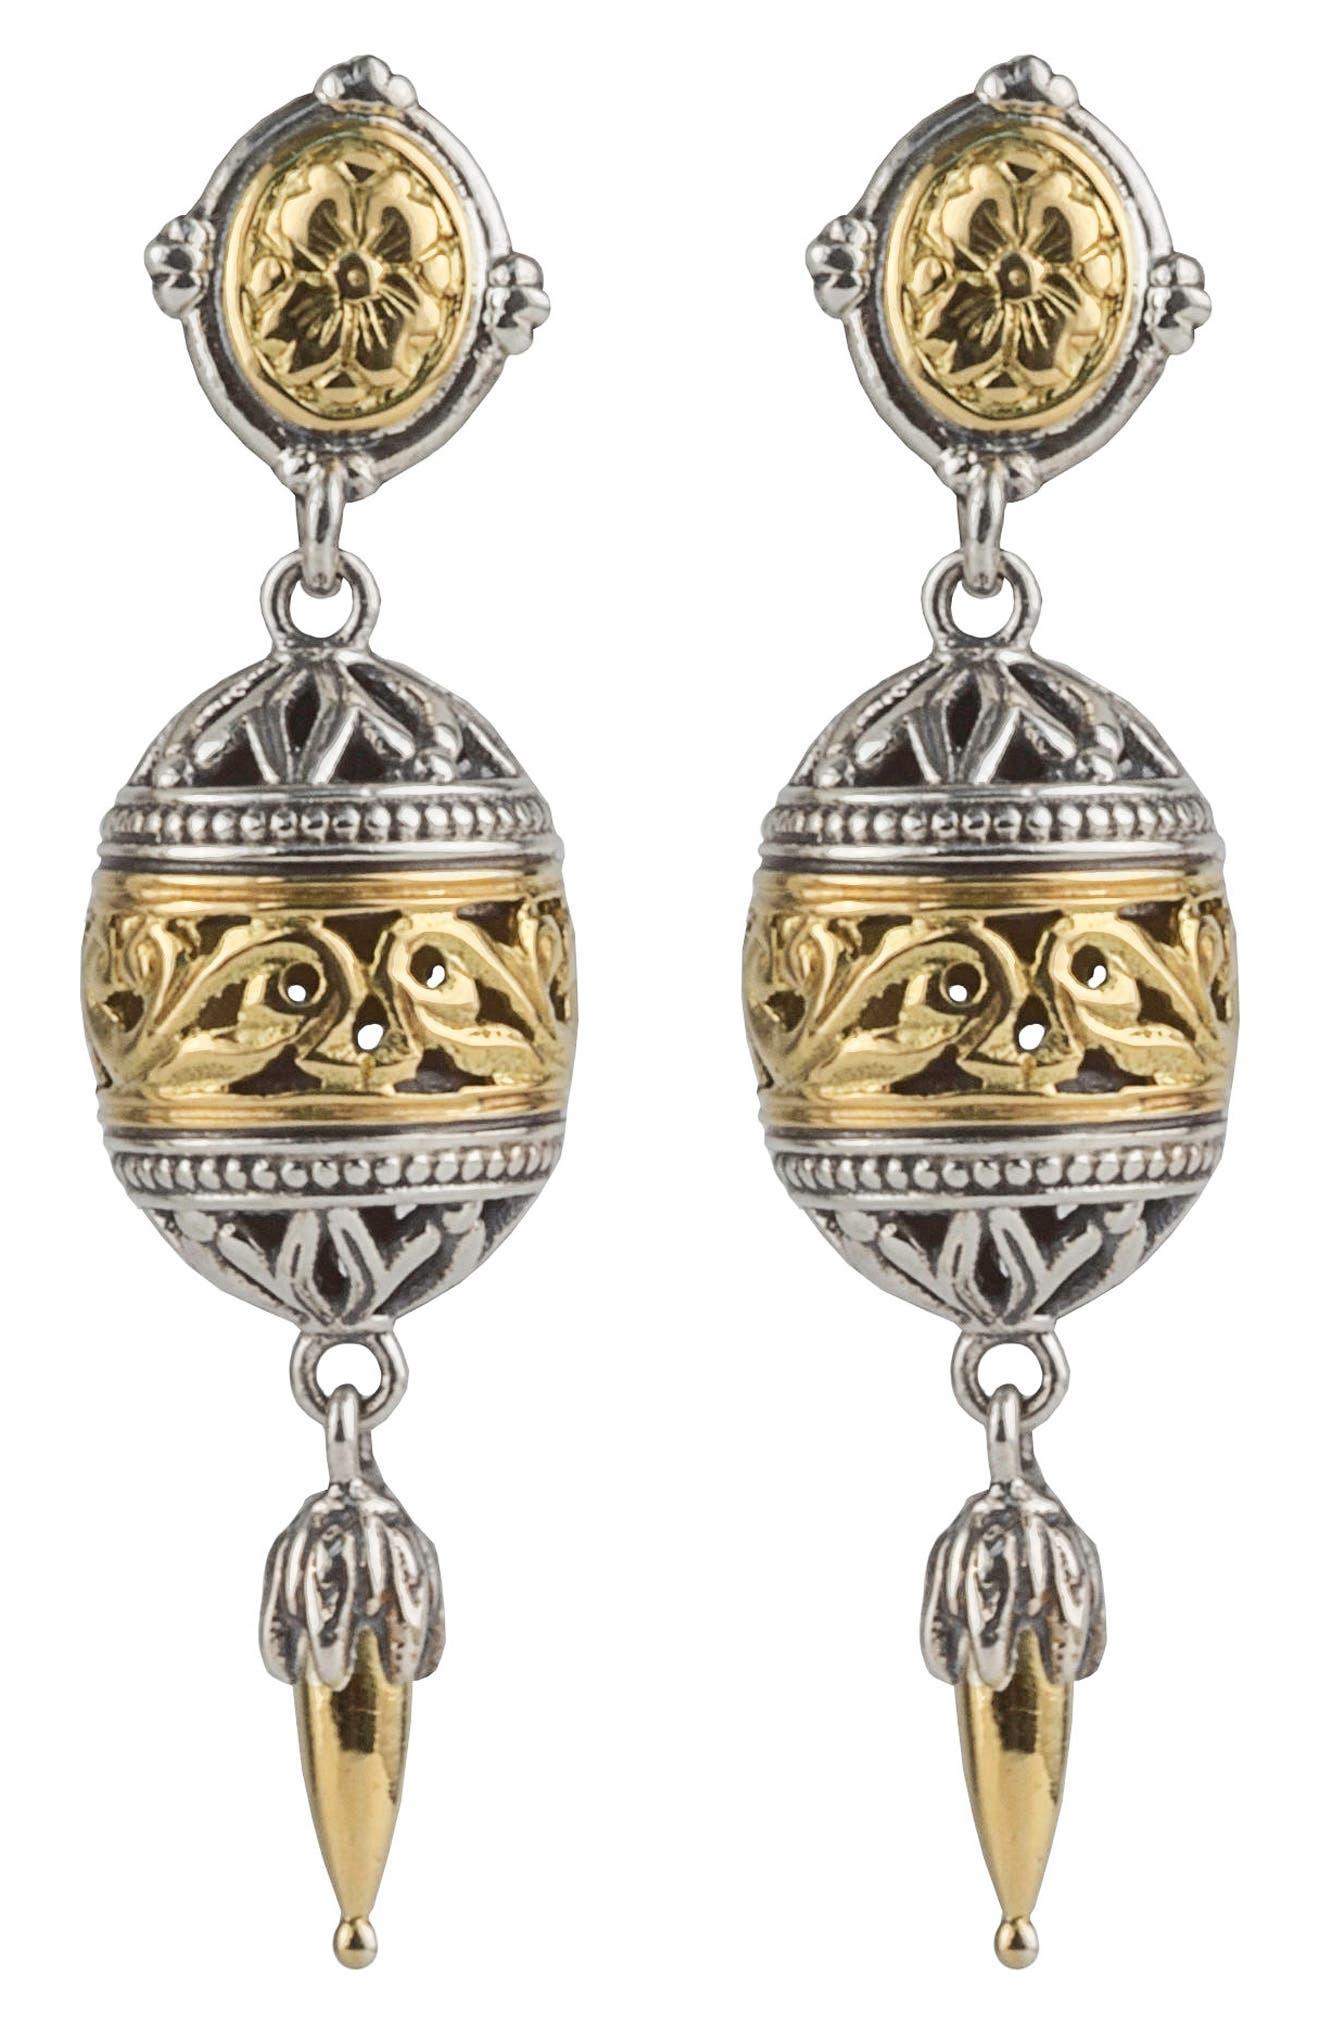 Gaia Filligree Drop Earrings,                             Main thumbnail 1, color,                             Silver/ Gold